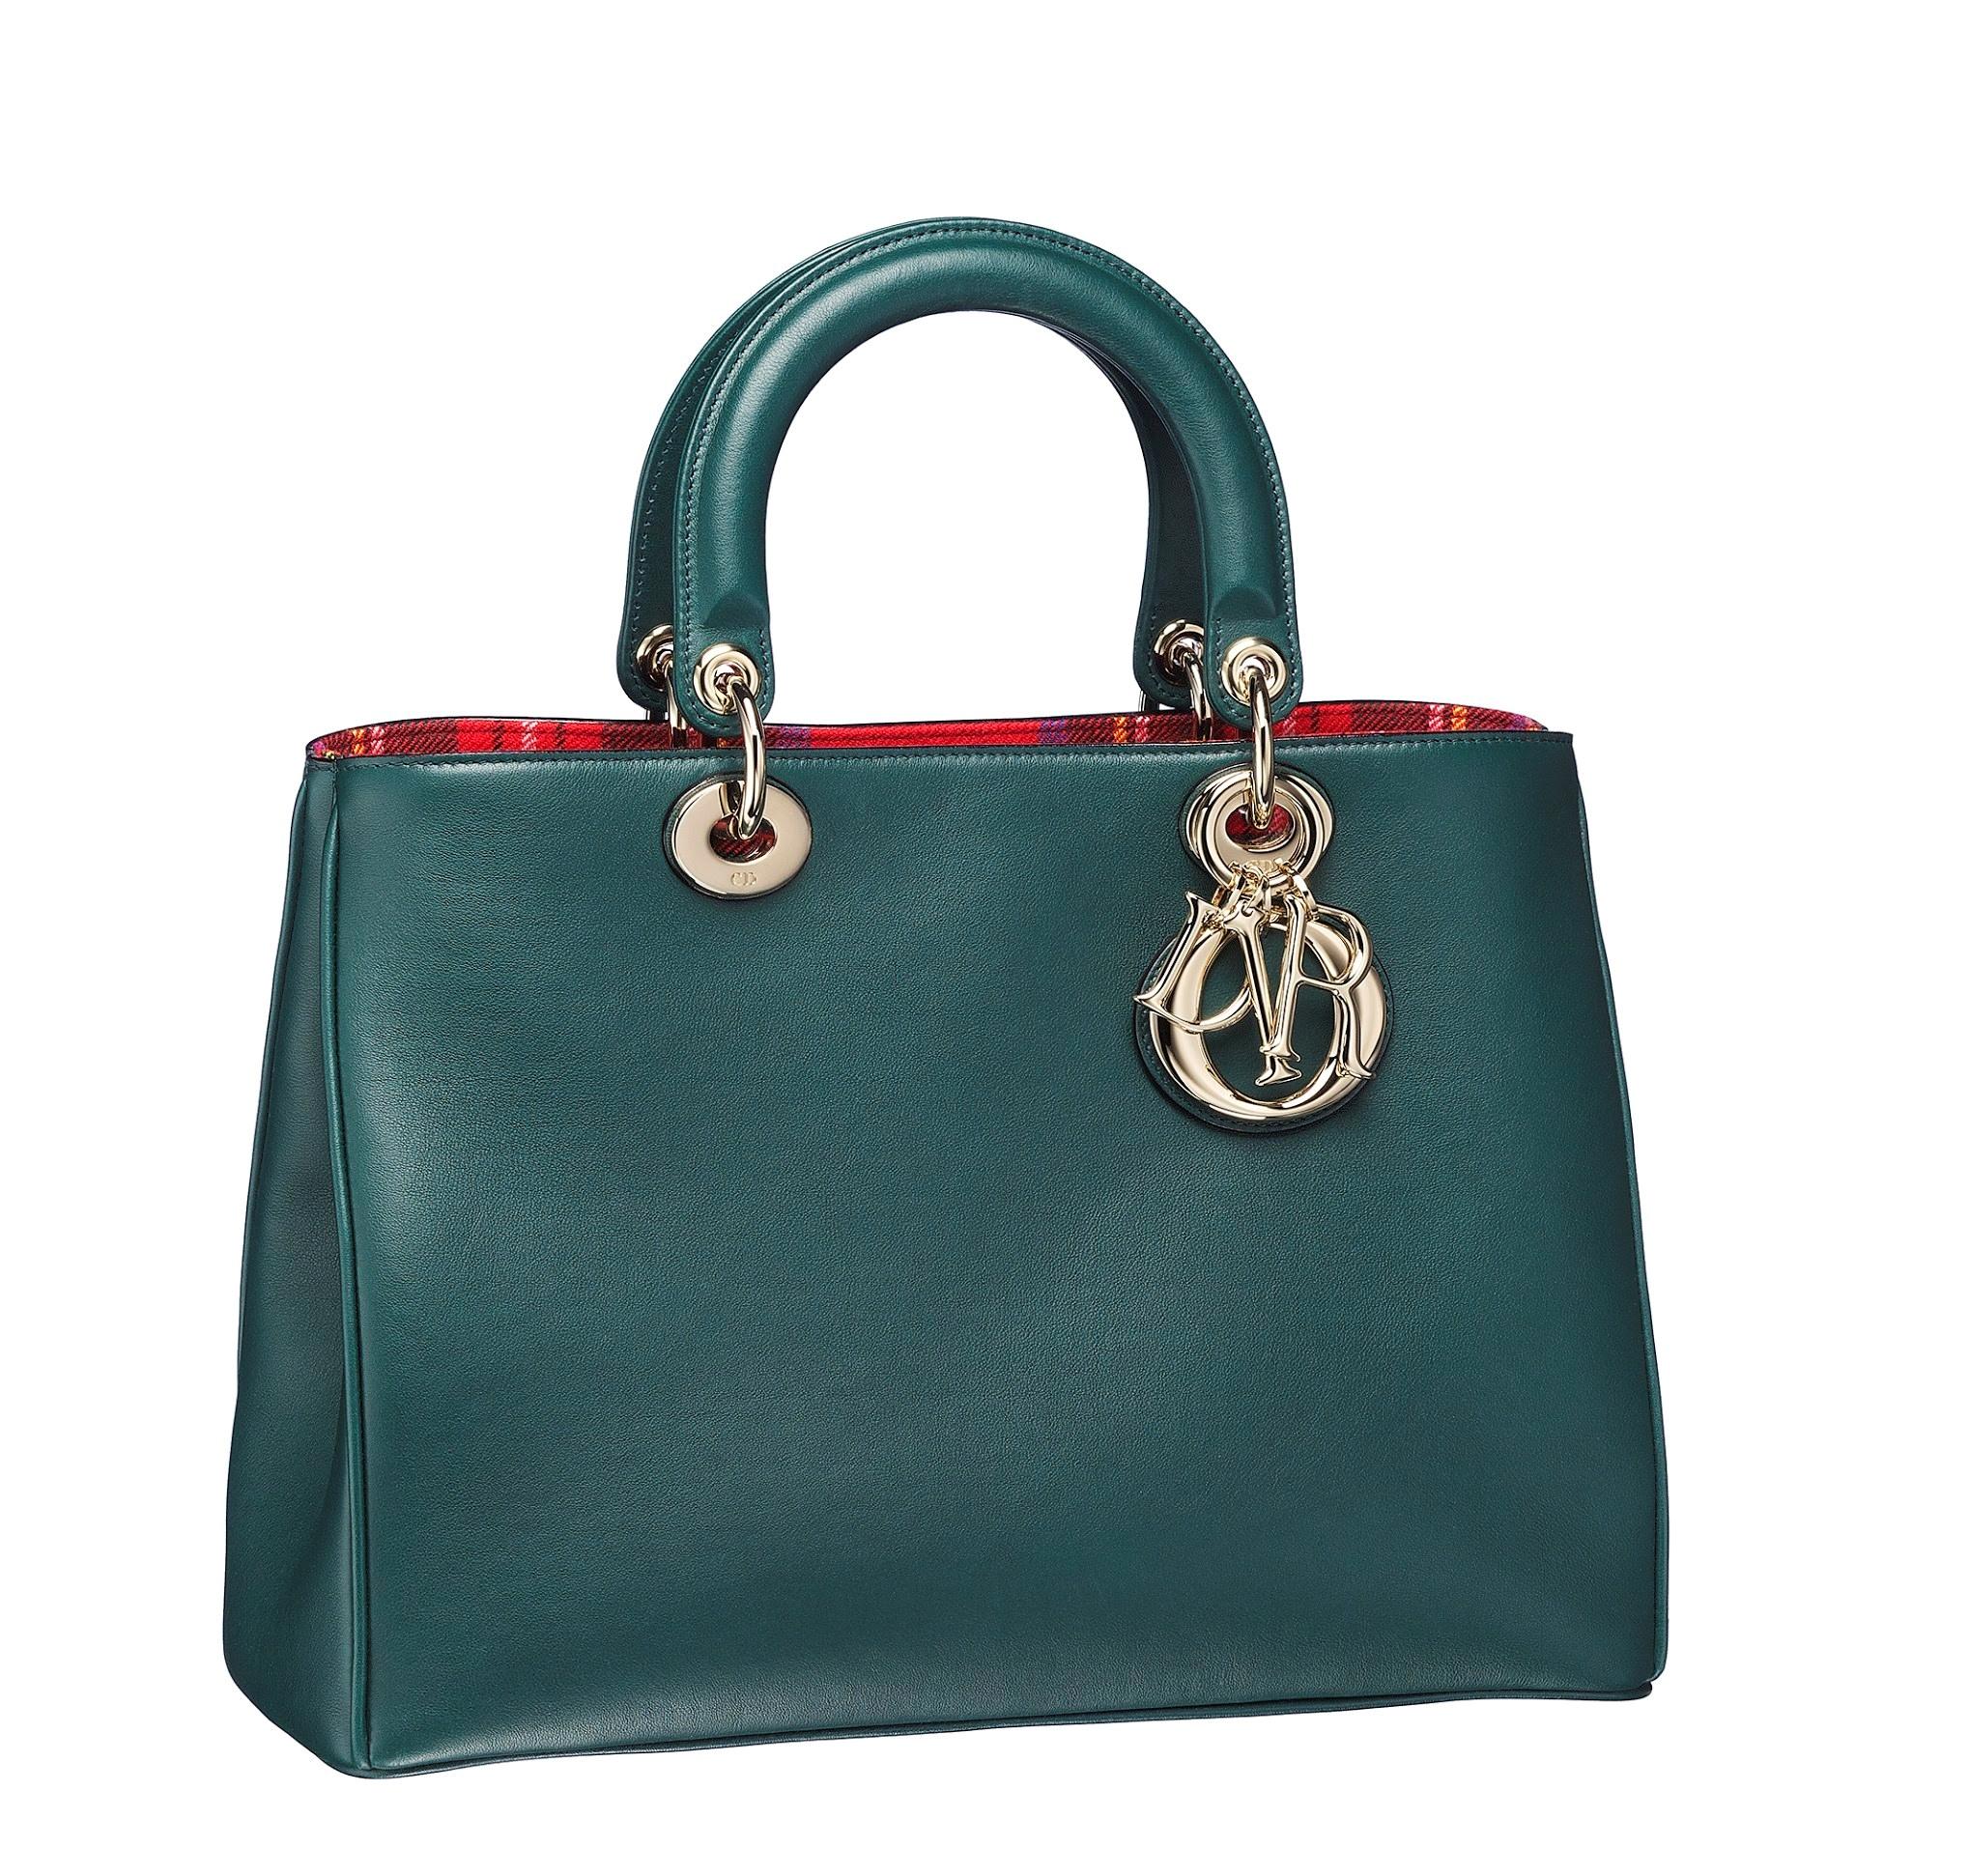 Christian-Dior-Diorissimo-bag-in-Vert-Anglais-calfskin